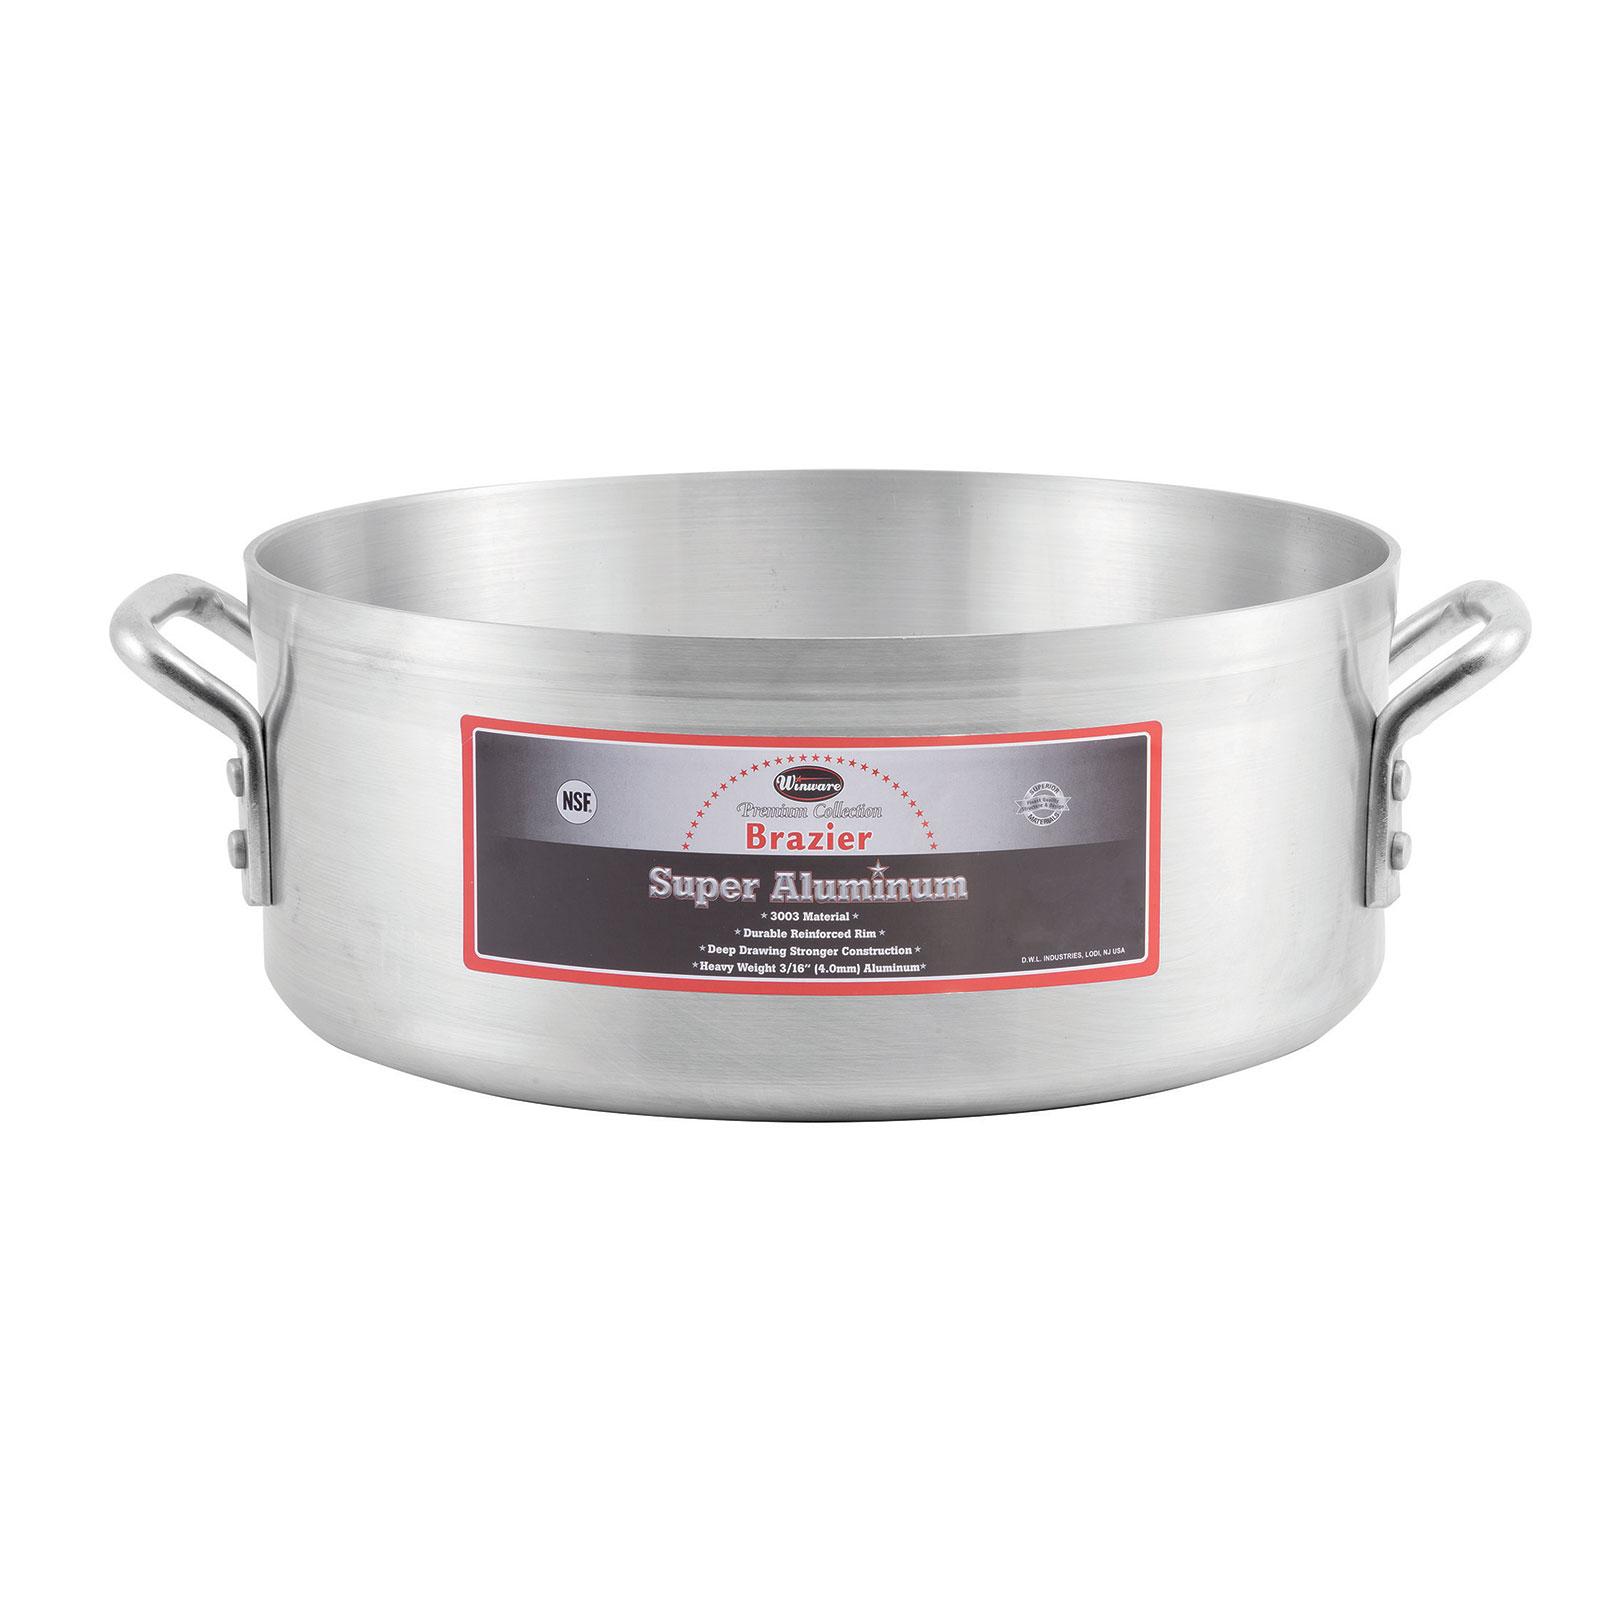 Winco AXBZ-24 brazier pan